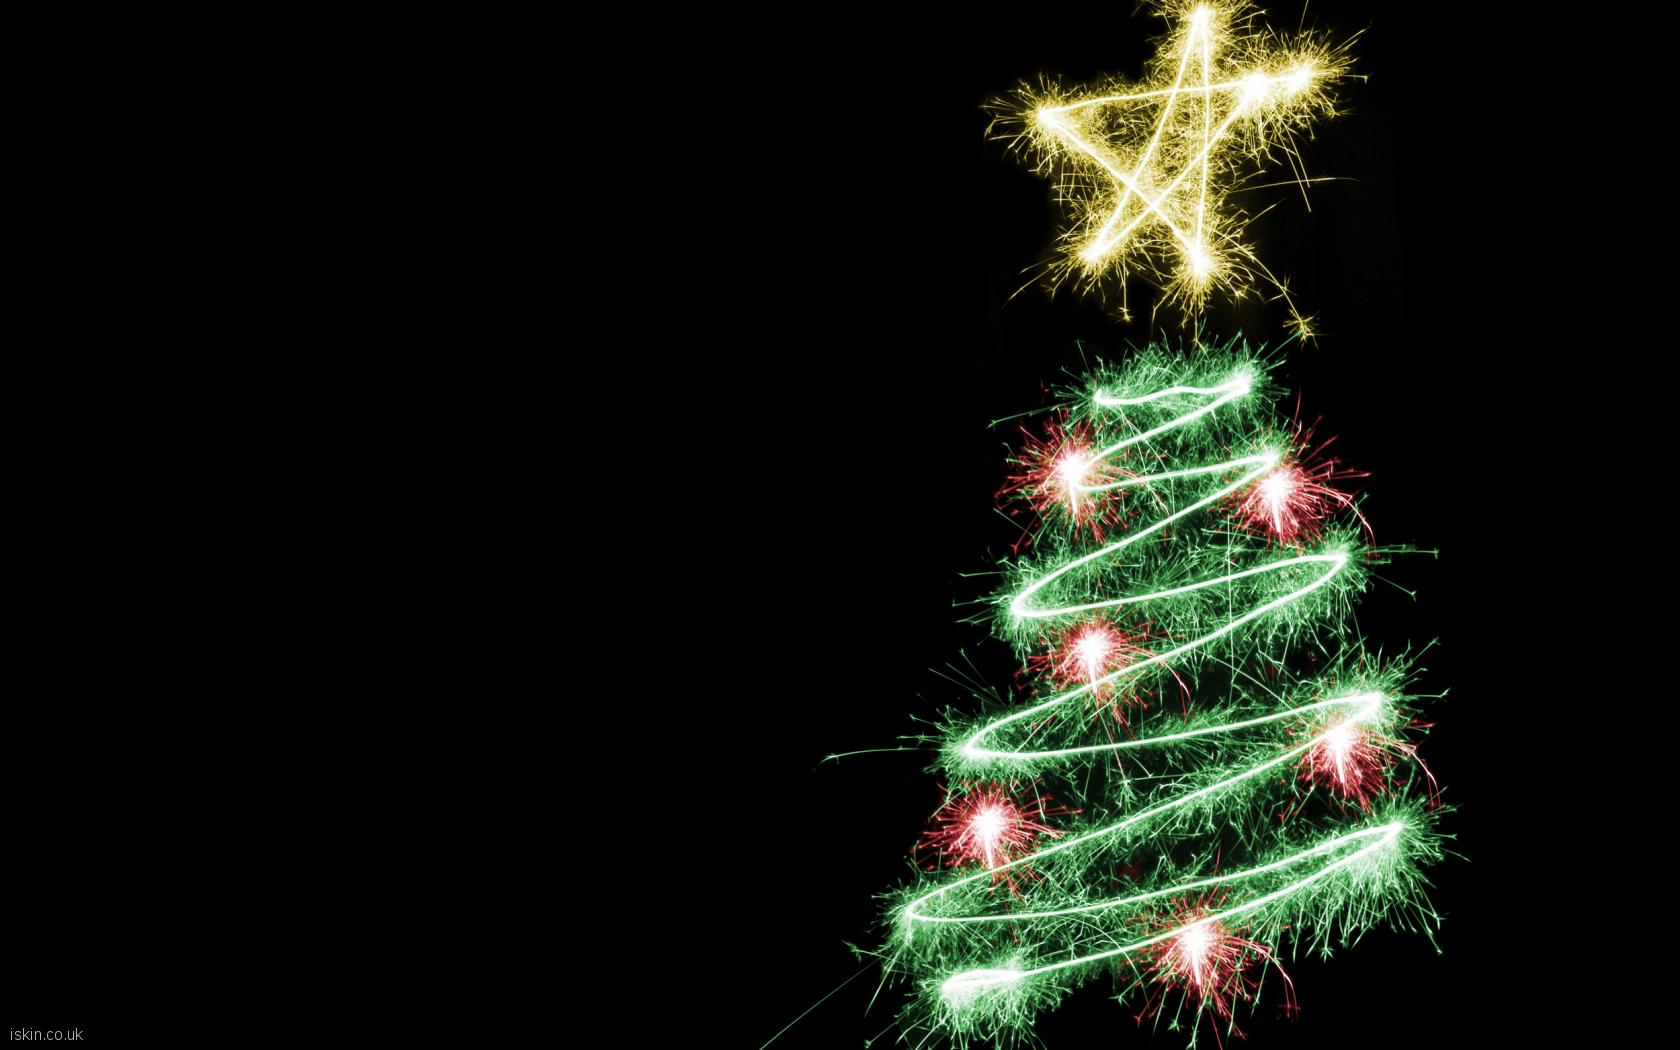 christmas tree wallpaper - Desktop Christmas Tree